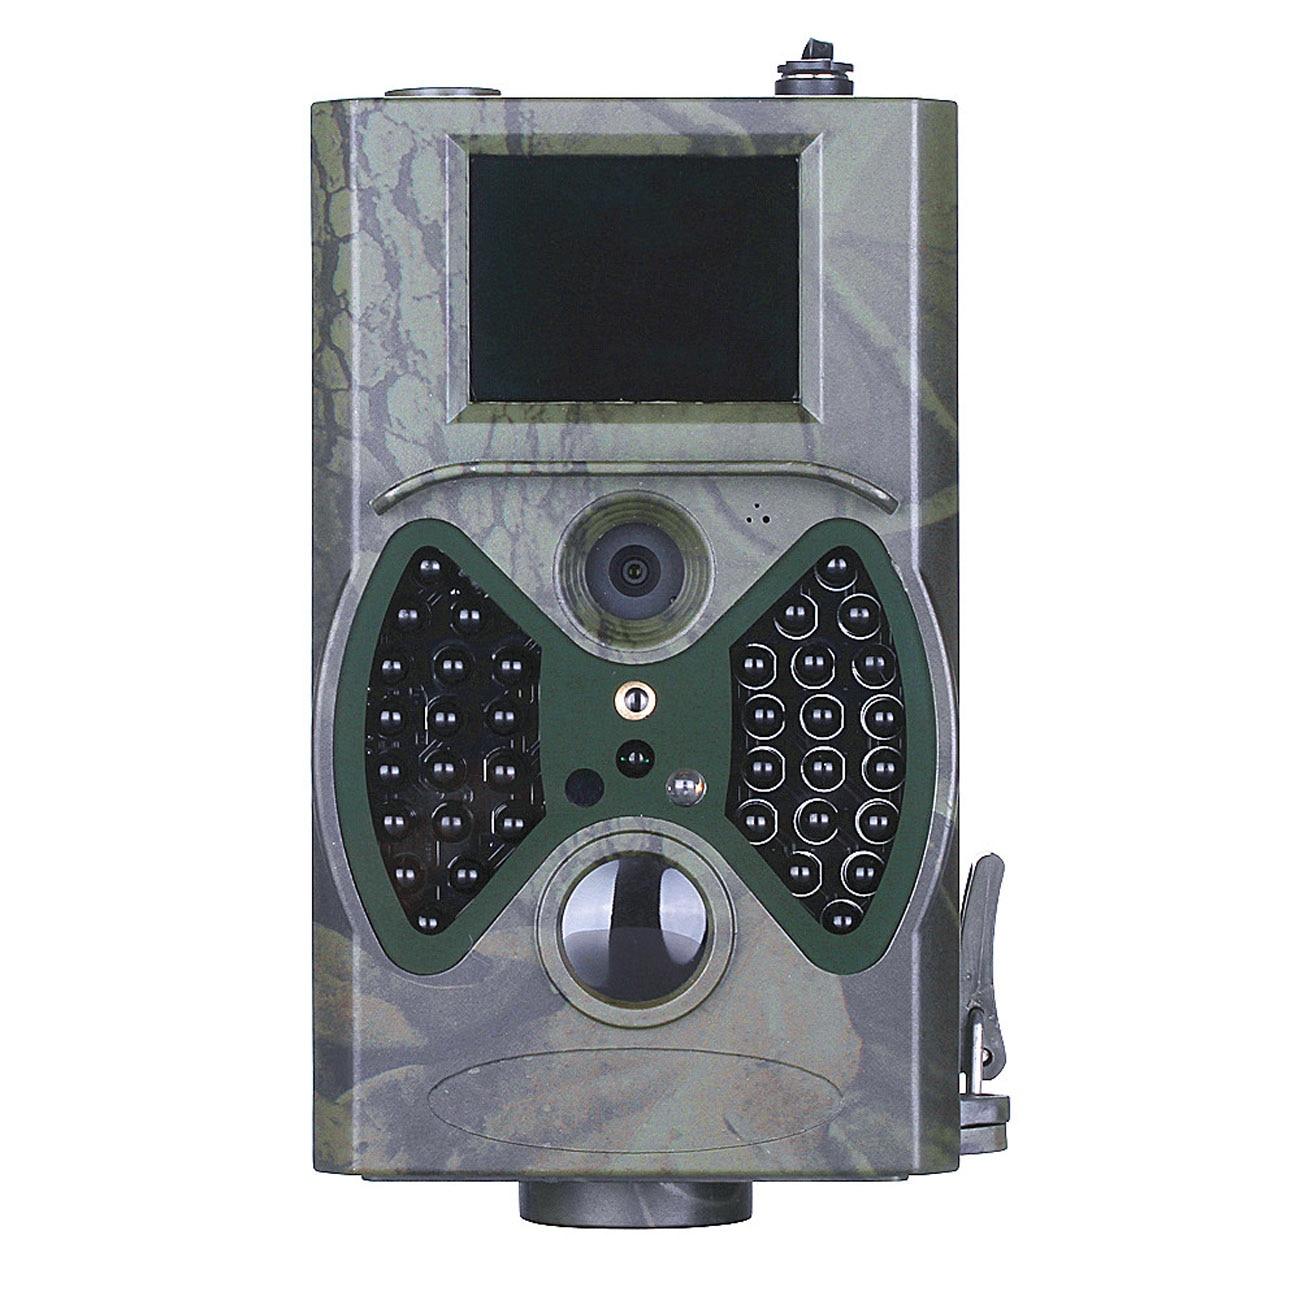 Hunting Trail Camera HC300A 16MP Night Vision 1080P Video Wildlife Camera Cams for Hunter Photos Trap Surveillance enlarge